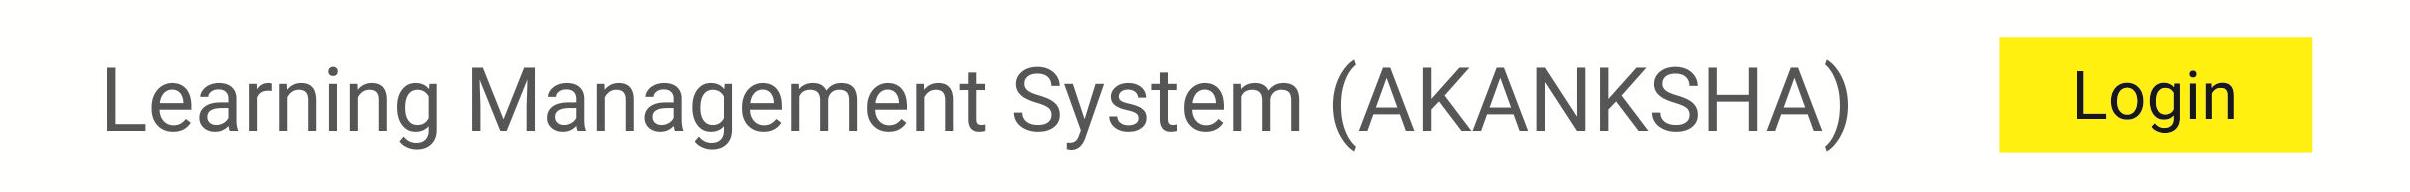 Akanksha - Learning Management System